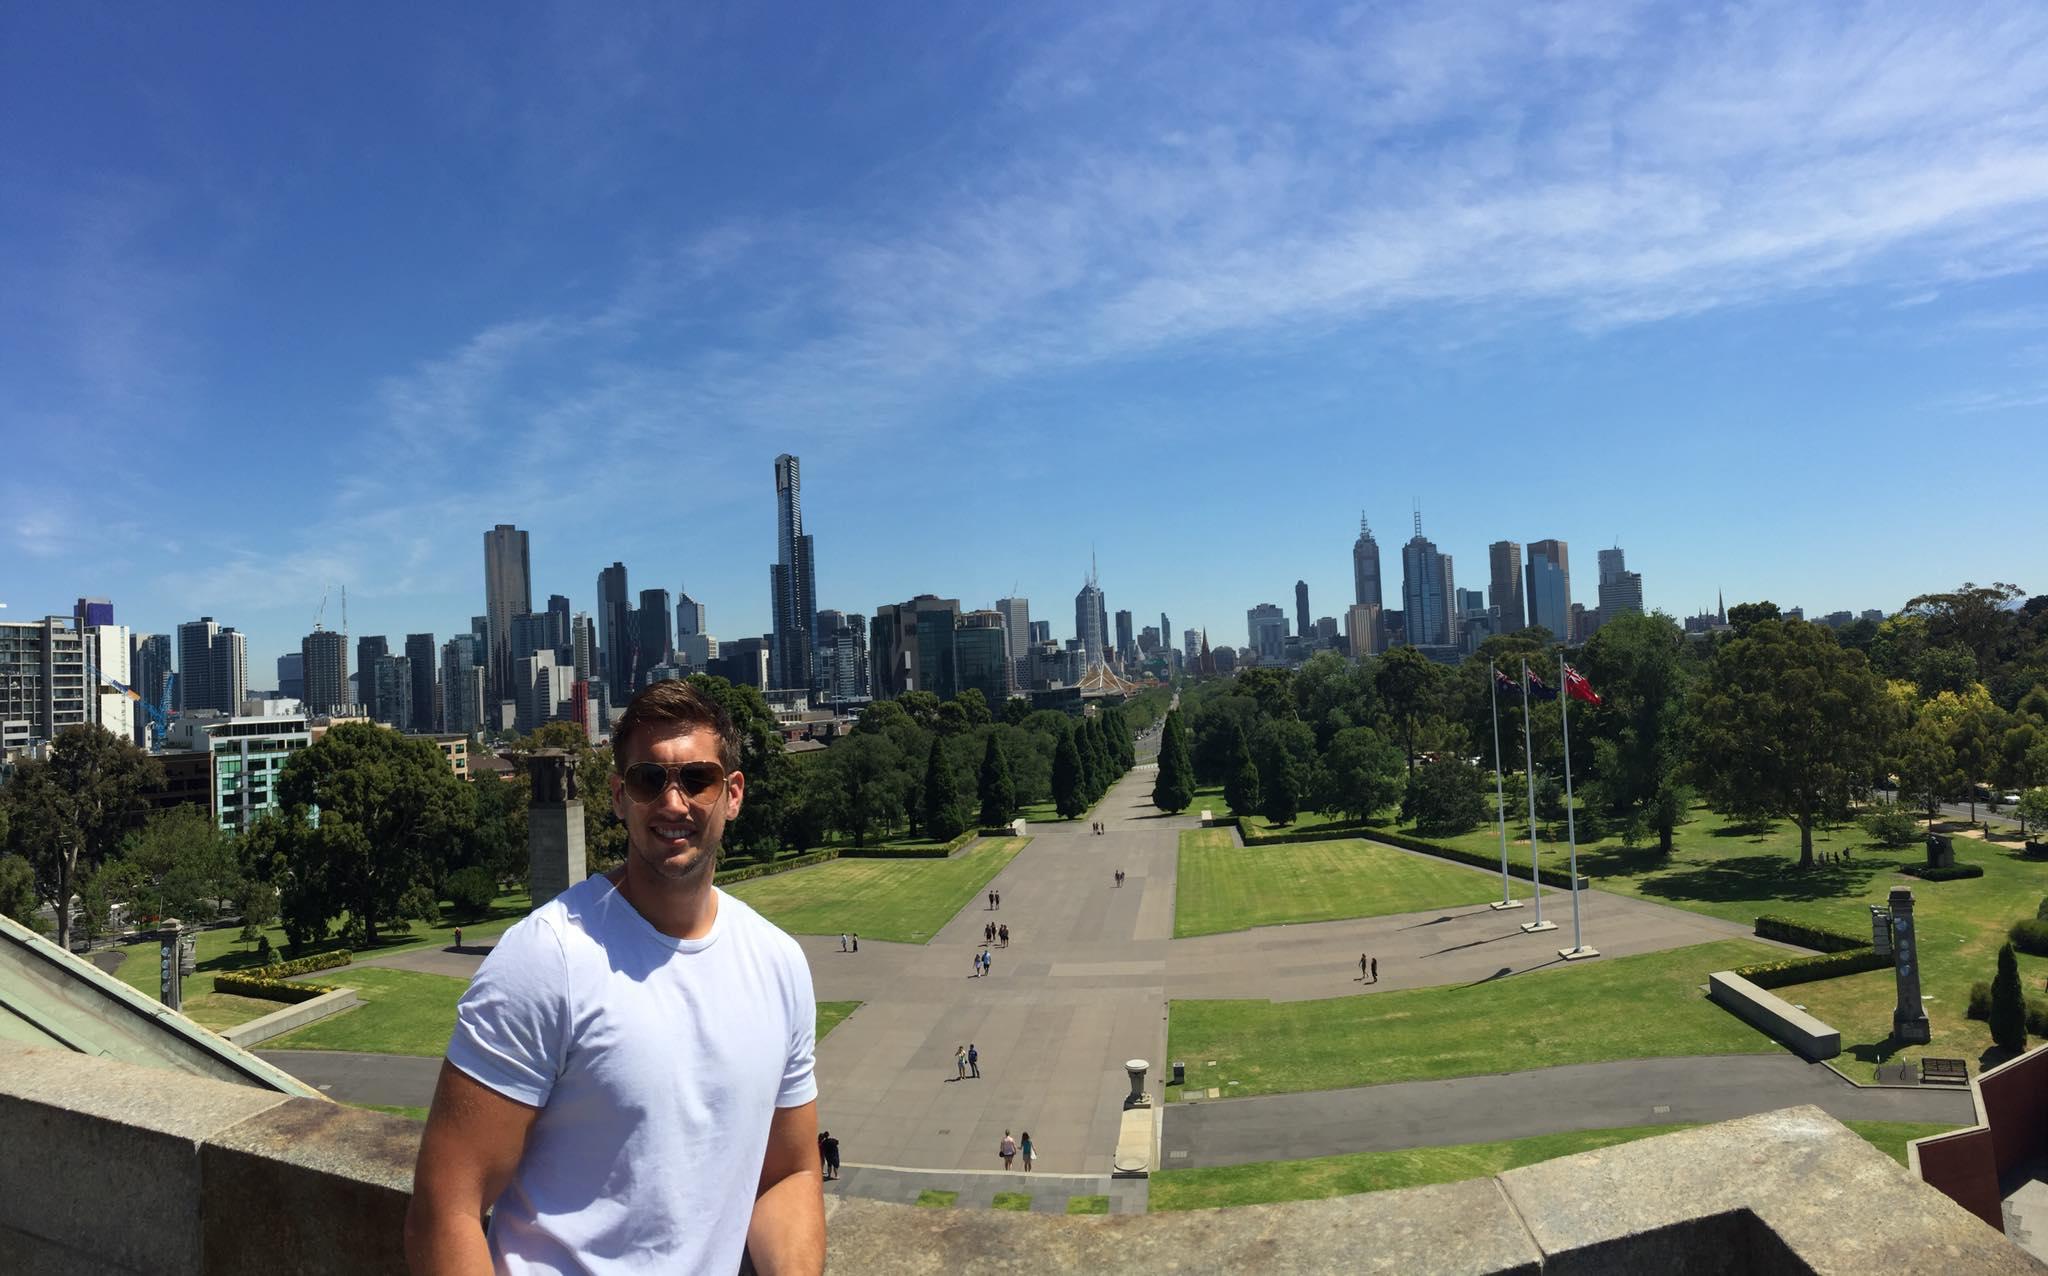 Matt at the Shrine of Remembrance, Melbourne Botanical Gardens